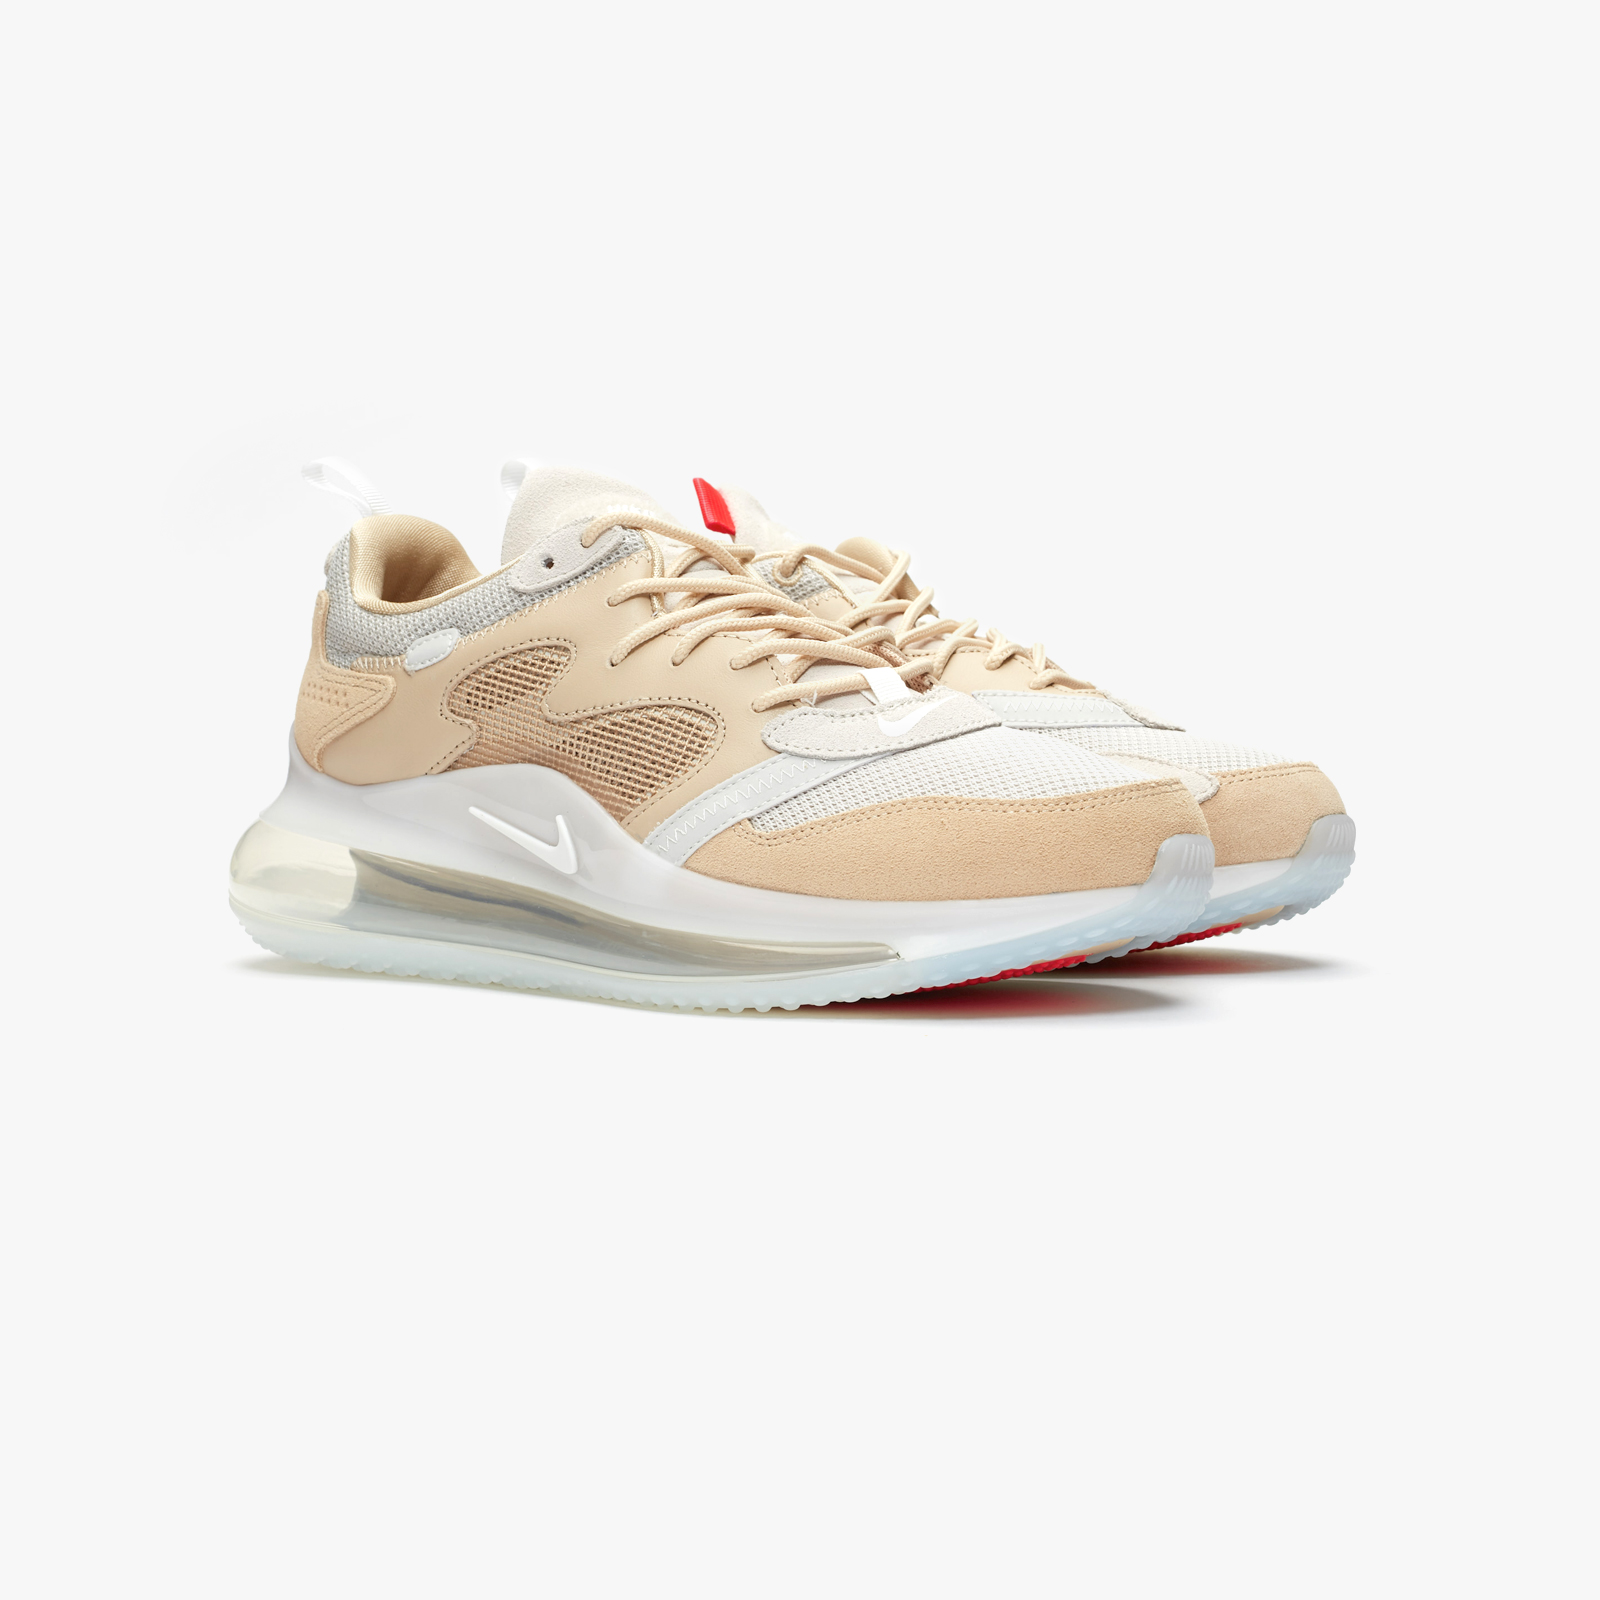 Nike Ck2531 200 Sneakersnstuff Max 720 Air I OBJ wO0knP8